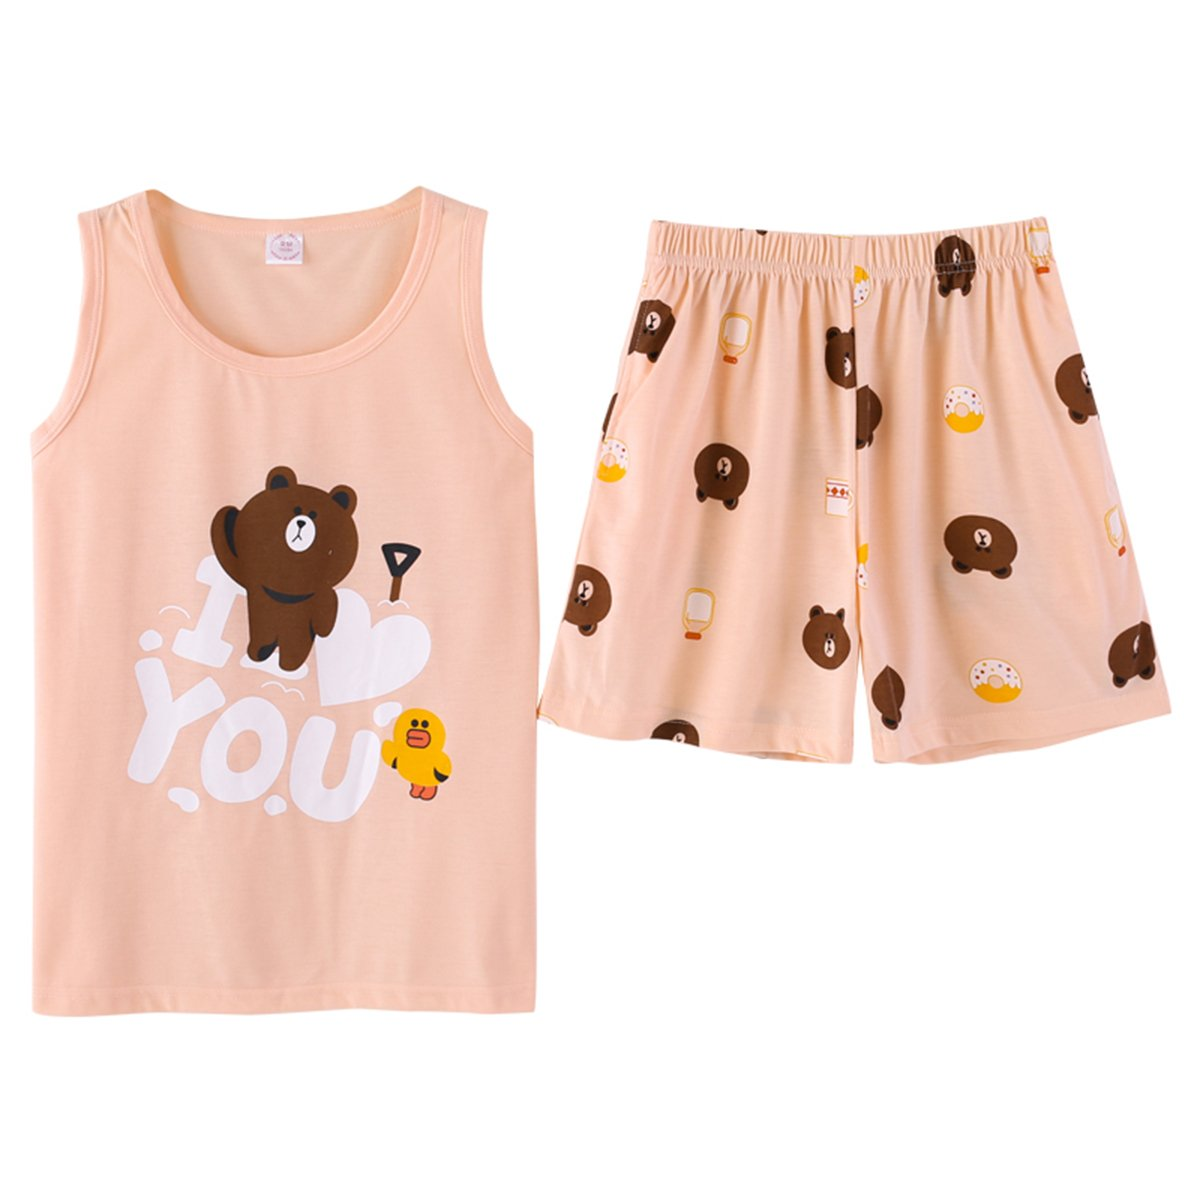 KINYBABY Girls Cotton Sleeveless Sleepwear Cute Bear Pajama Sets Nighty Loungewear